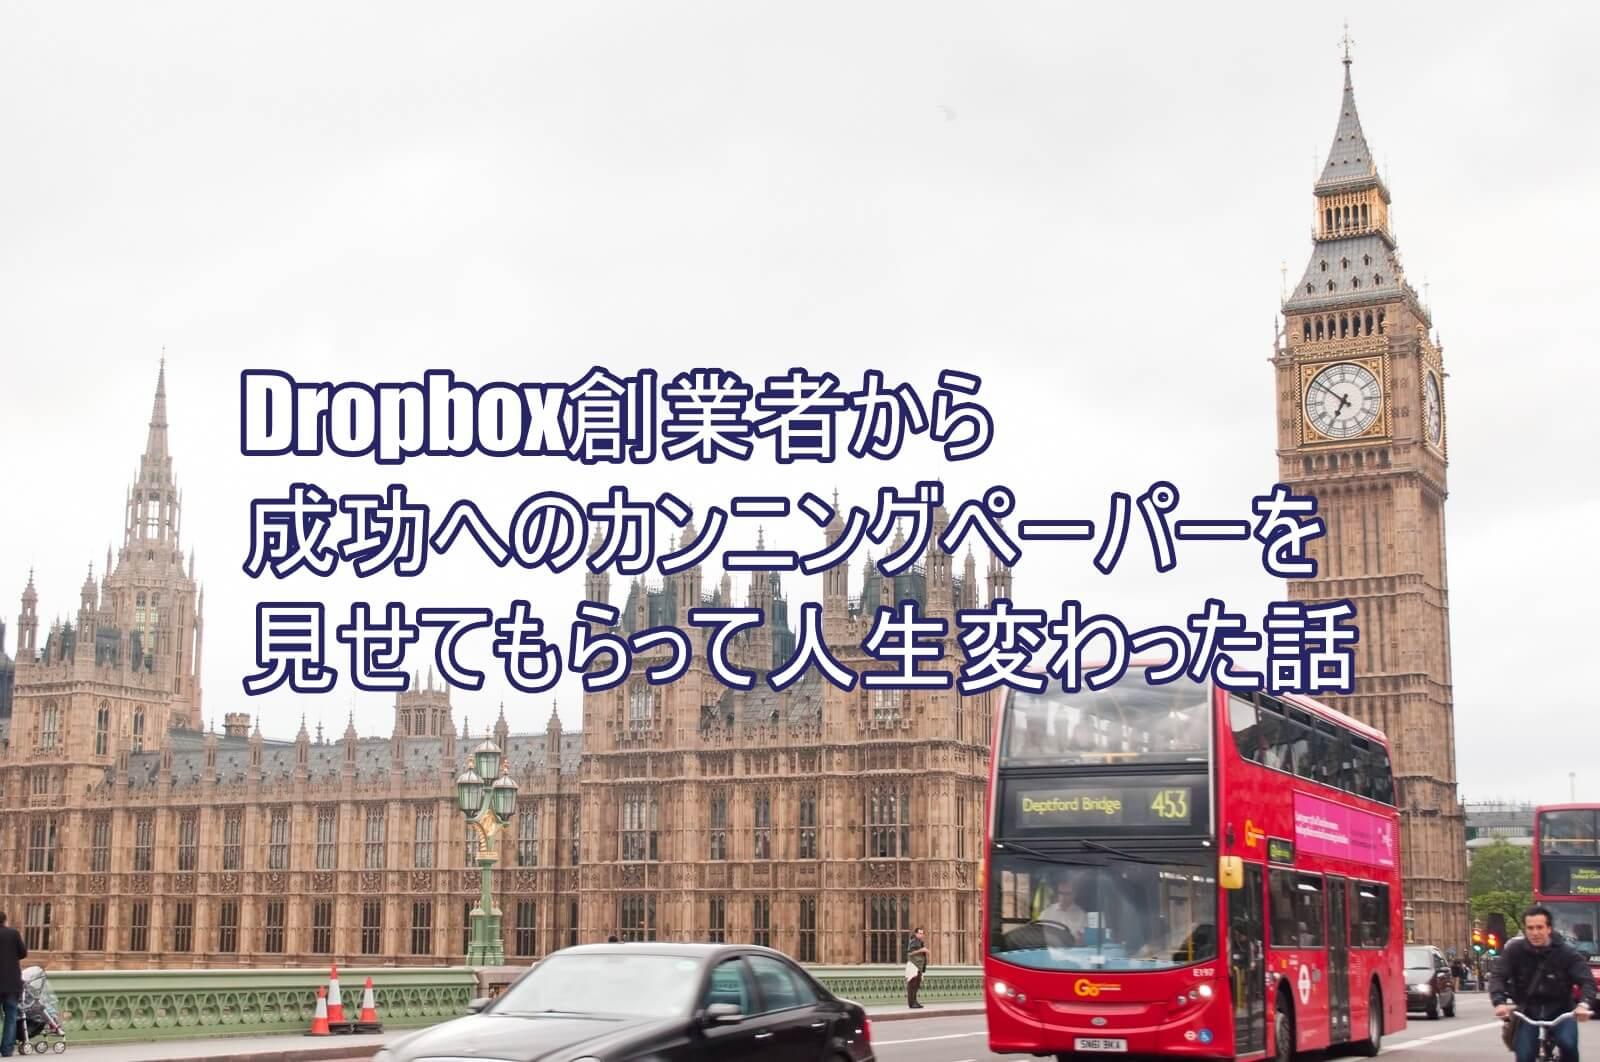 Dropbox創業者から成功へのカンニングペーパーを見せてもらって人生変わった話